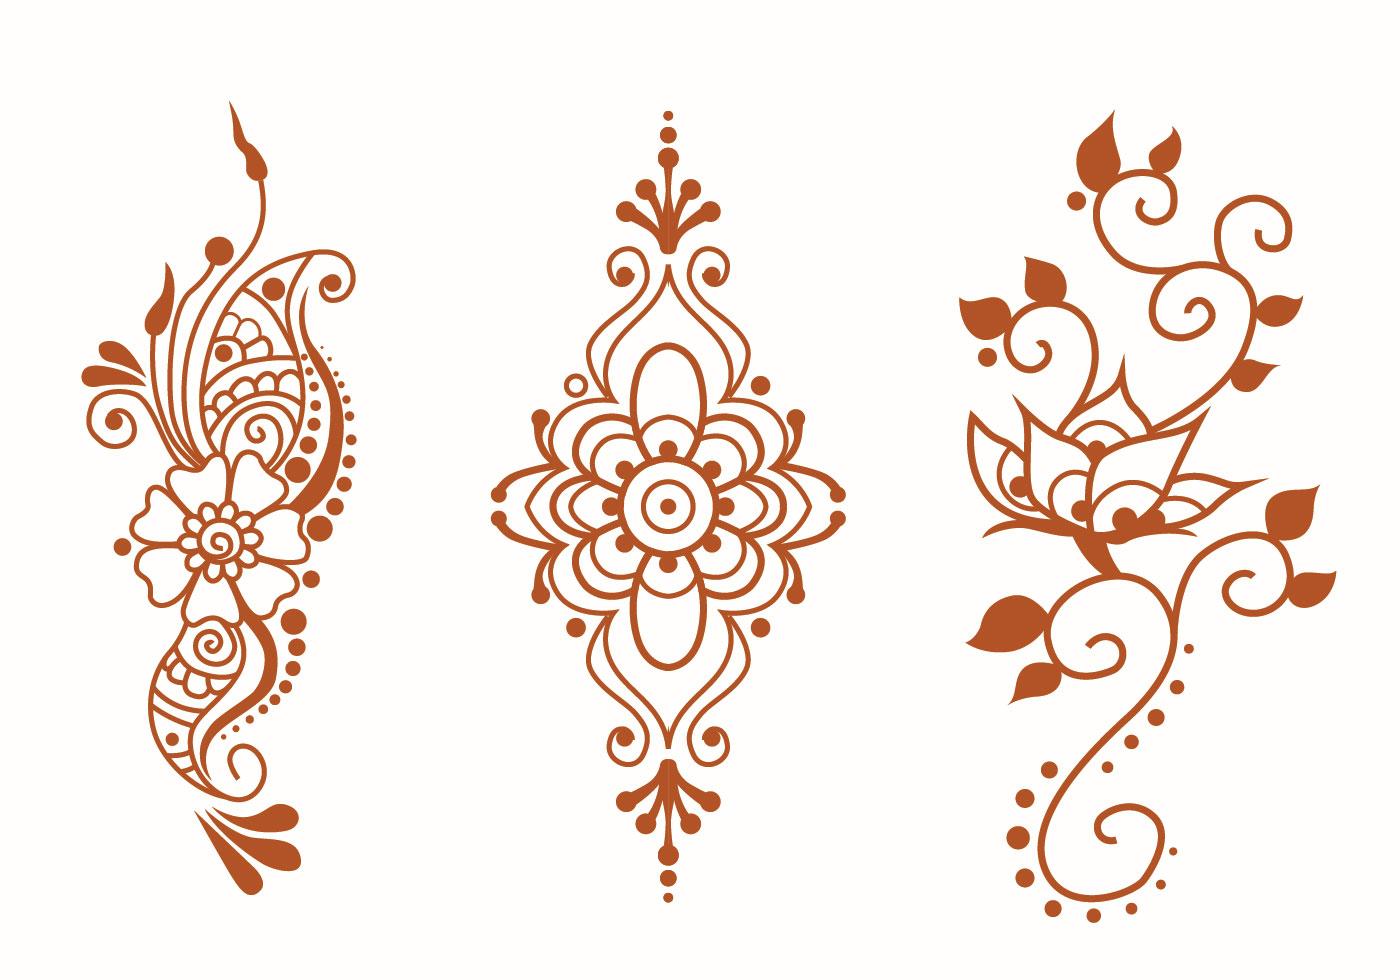 Henna Tattoo Vector: Download Free Vectors, Clipart